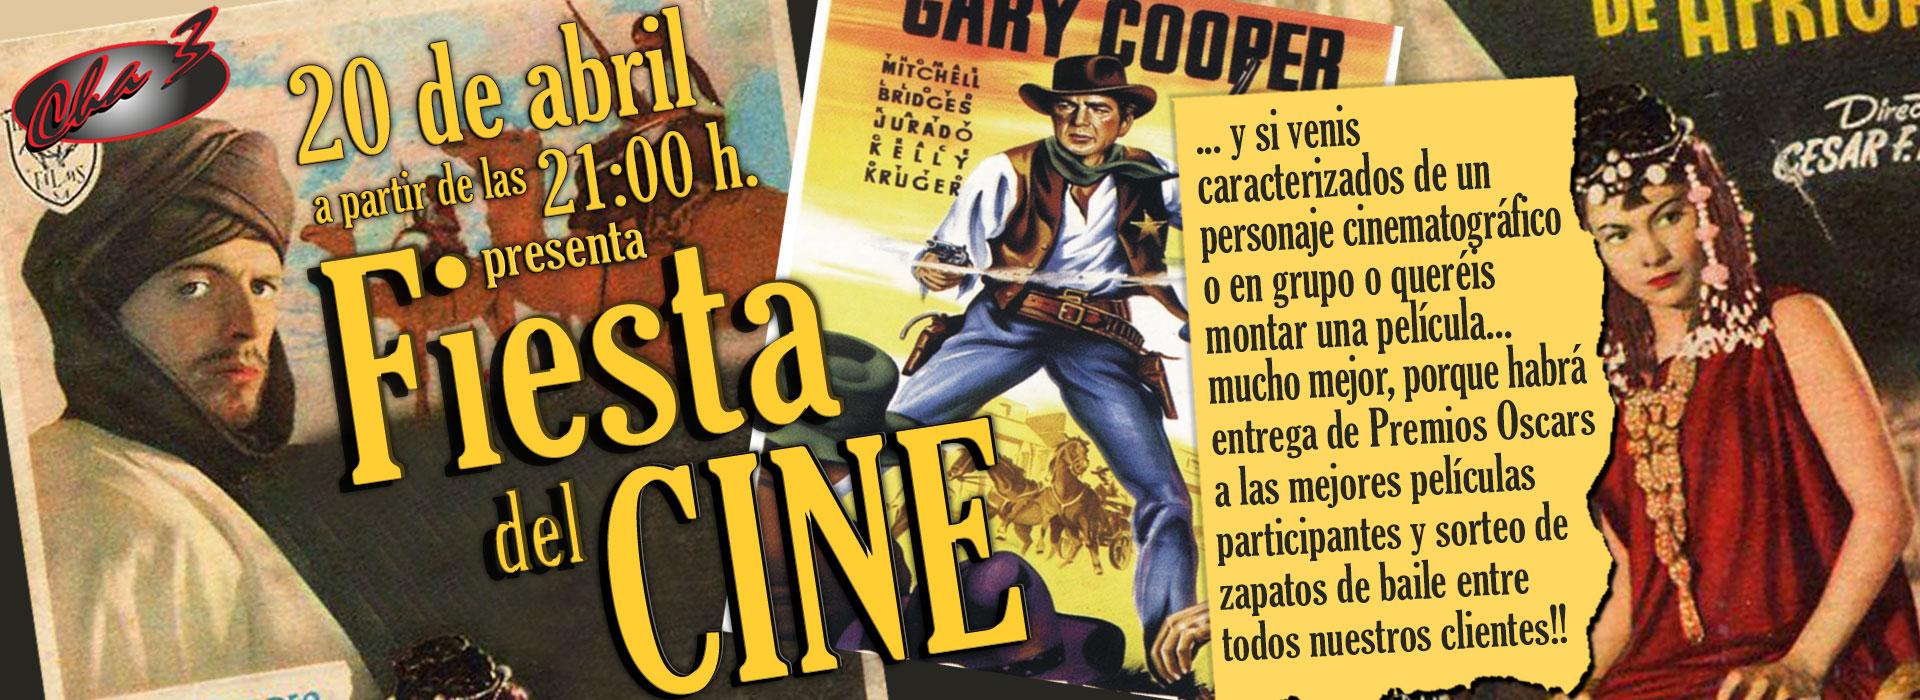 Fiesta-del-cine-2018